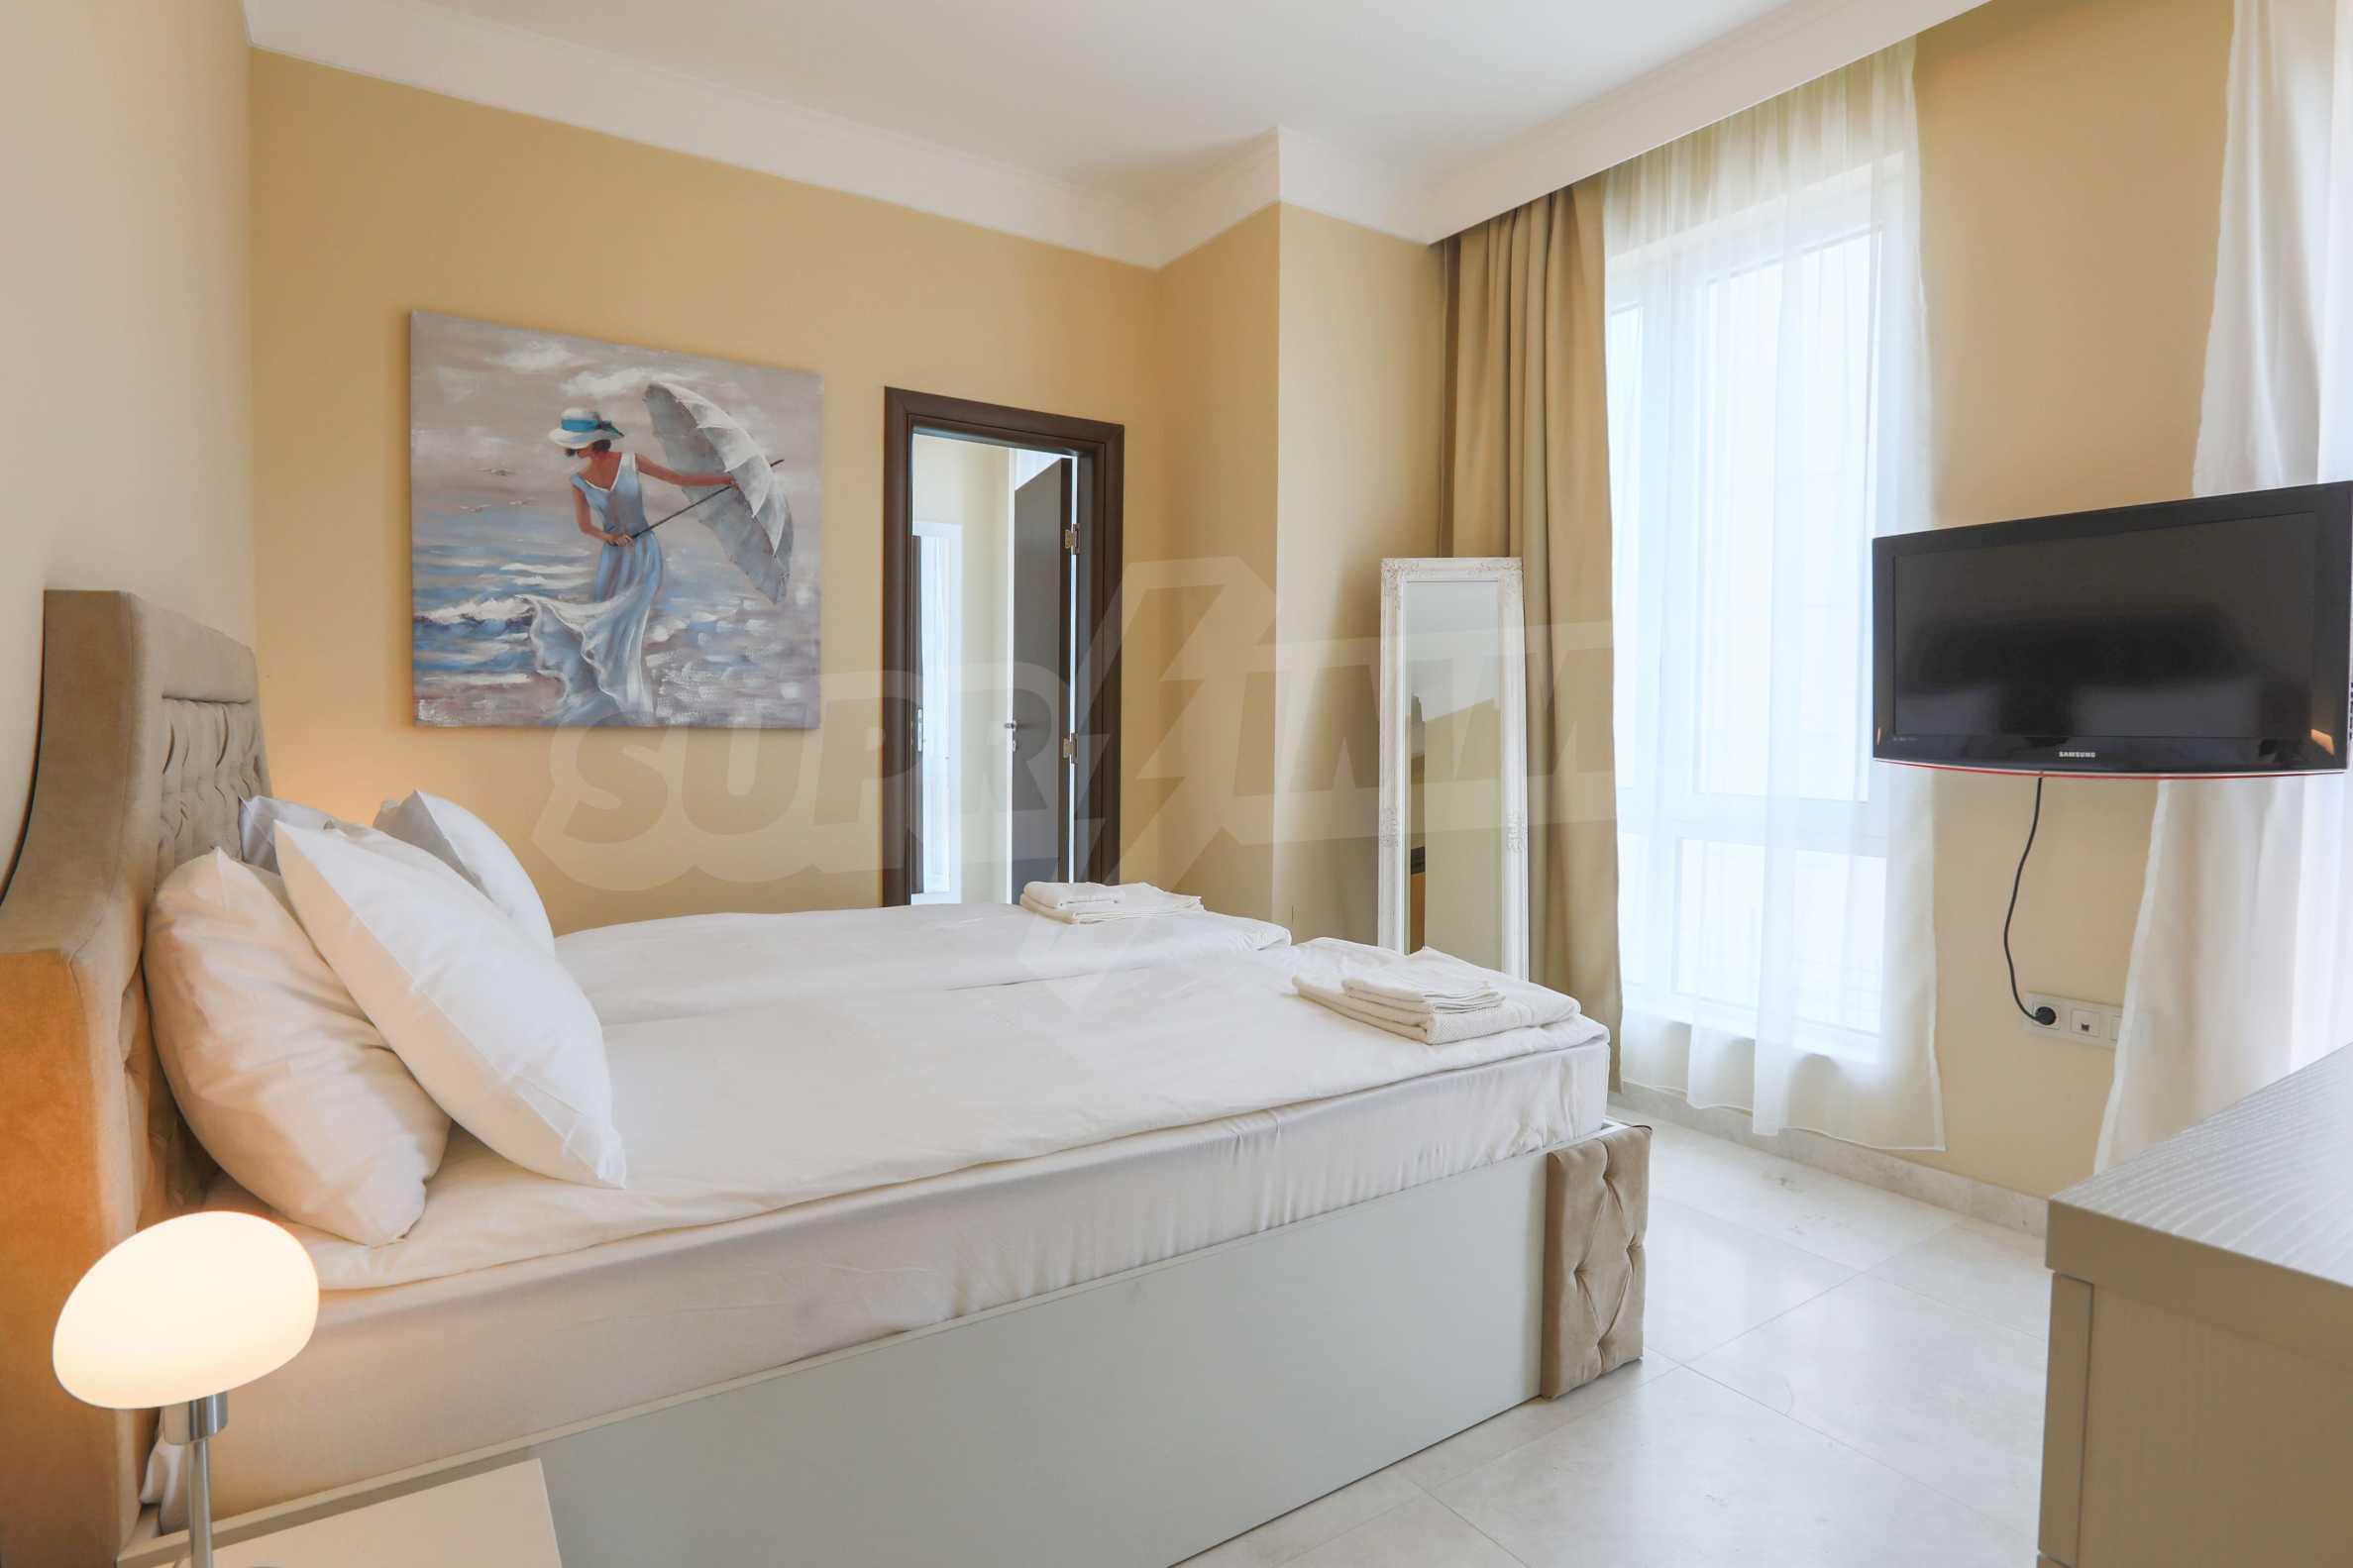 Комфортен двустаен апартамент под наем в Belle Époque Beach Residence, курорт Лозенец 12